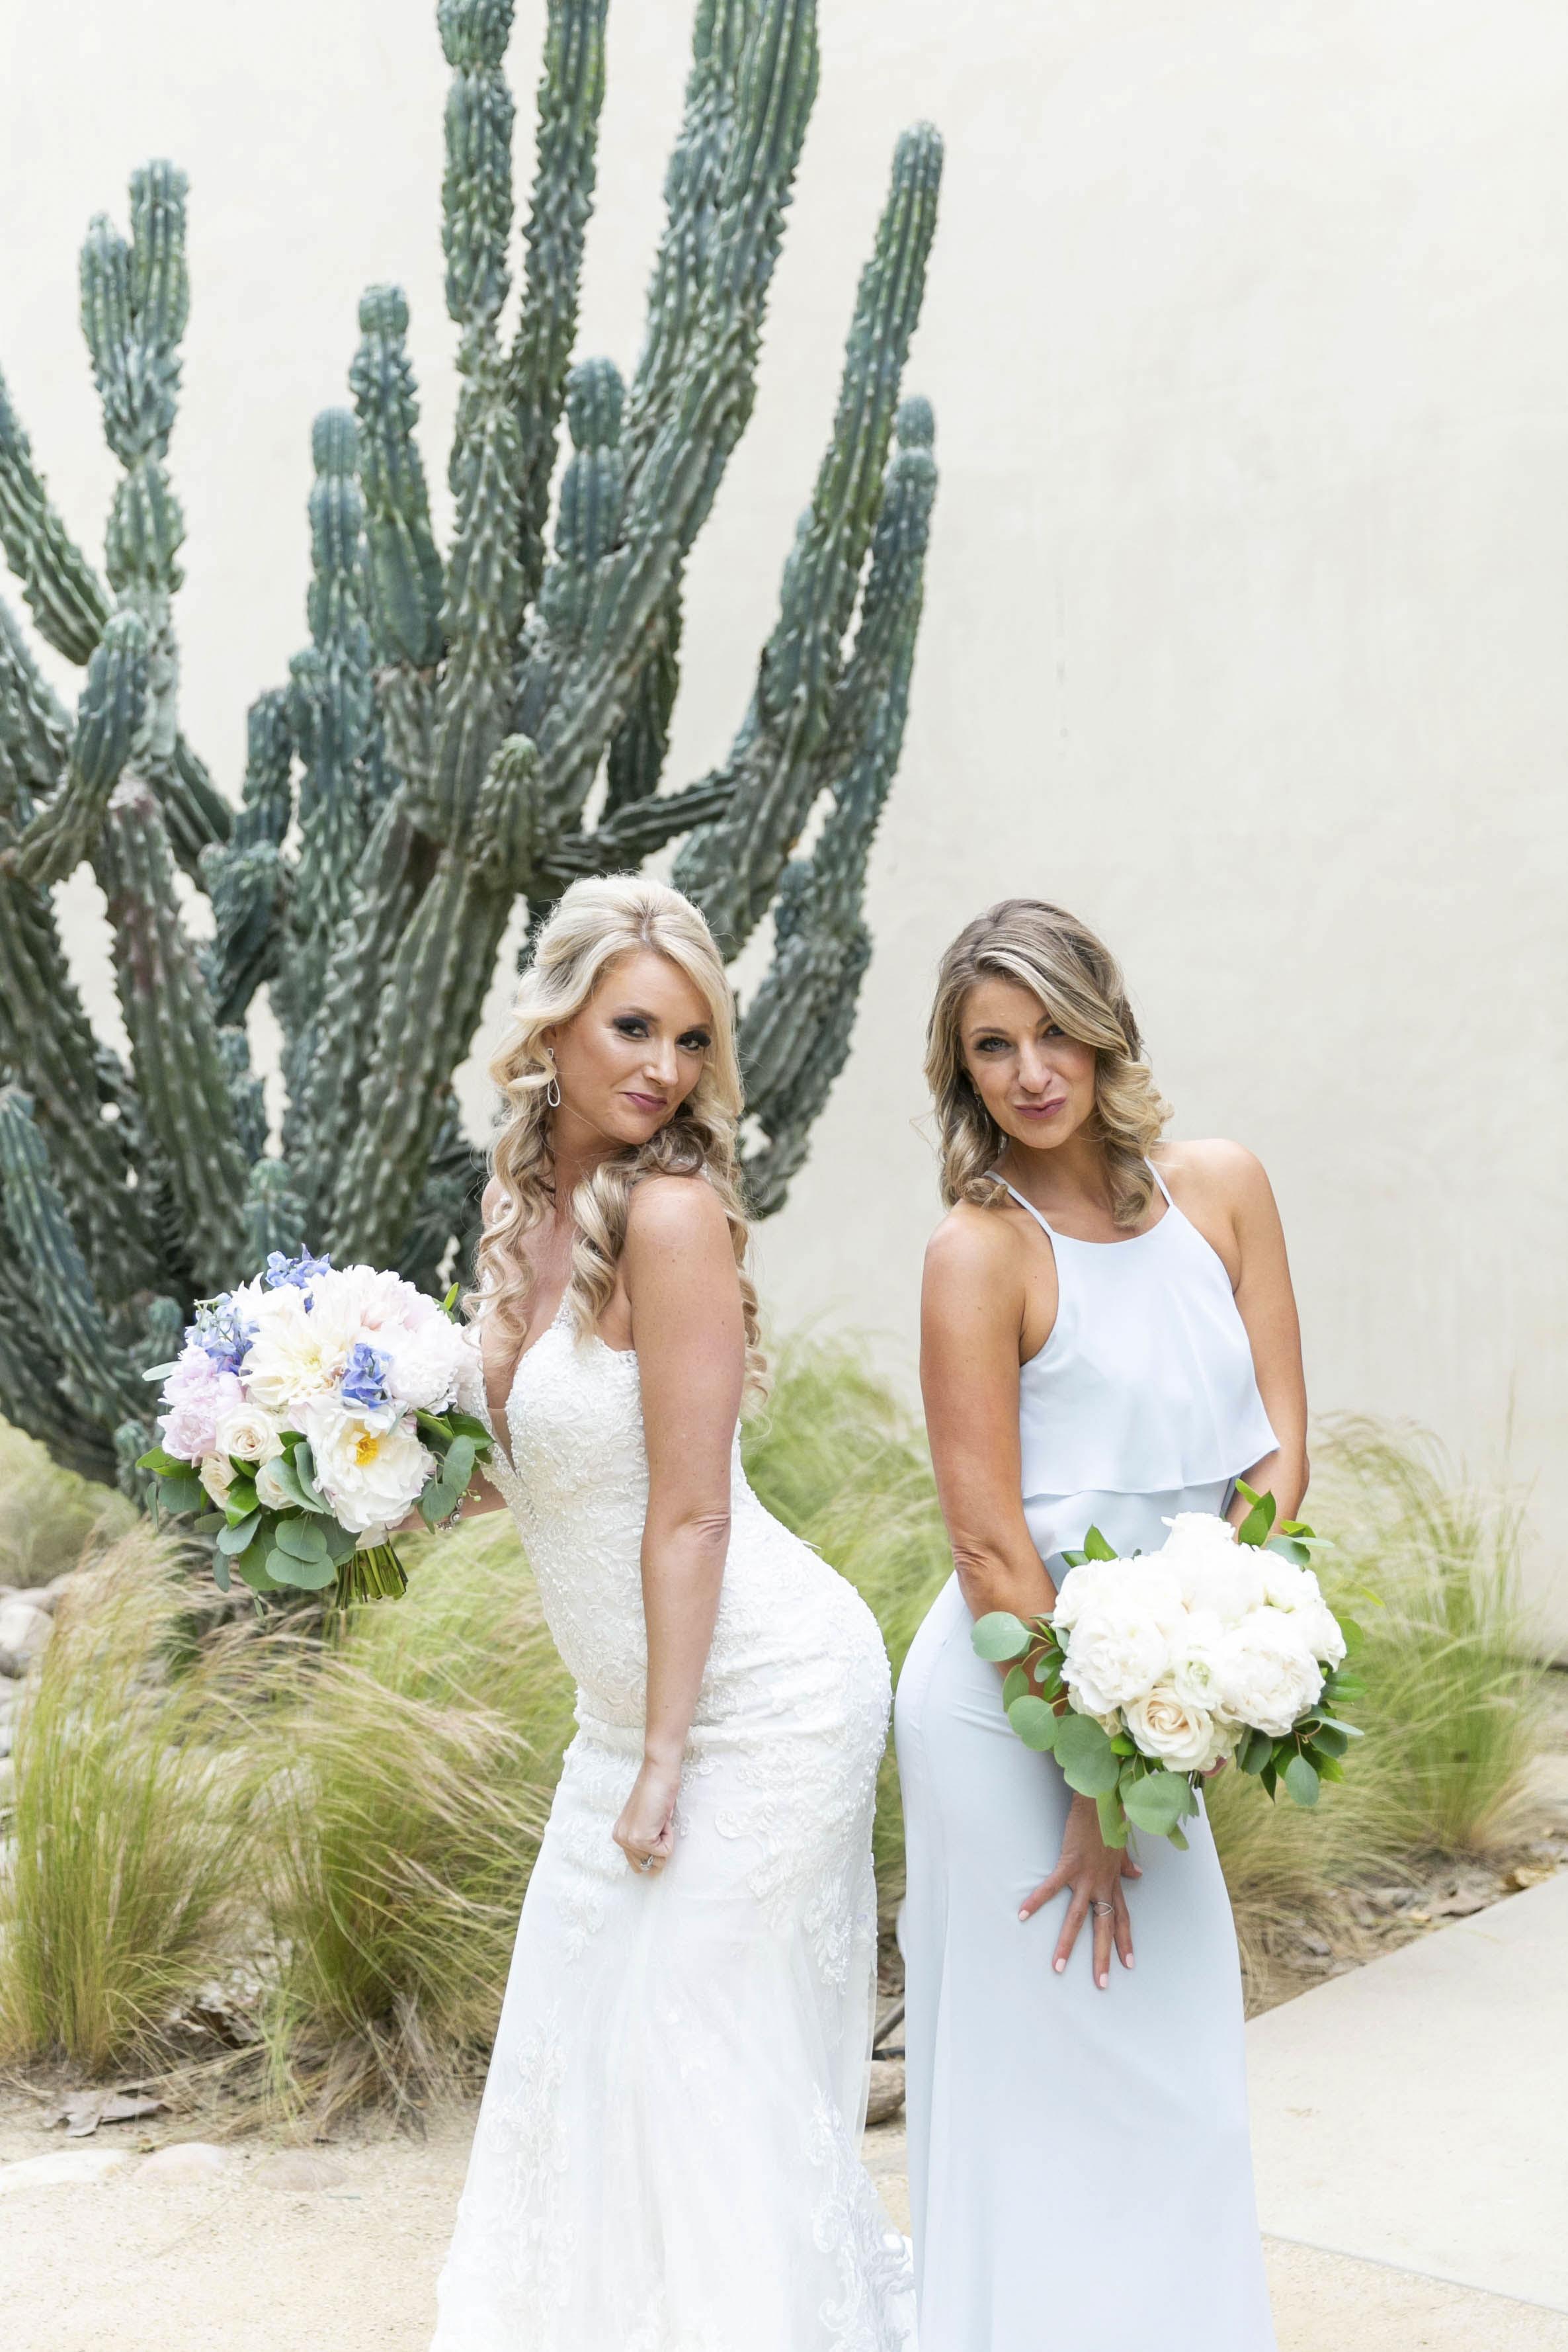 Domenica Beauty _ Hair and Makeup Artist _Wedding _ Temecula, CA Wedding _ Briana and Samuel _ 23.JPG